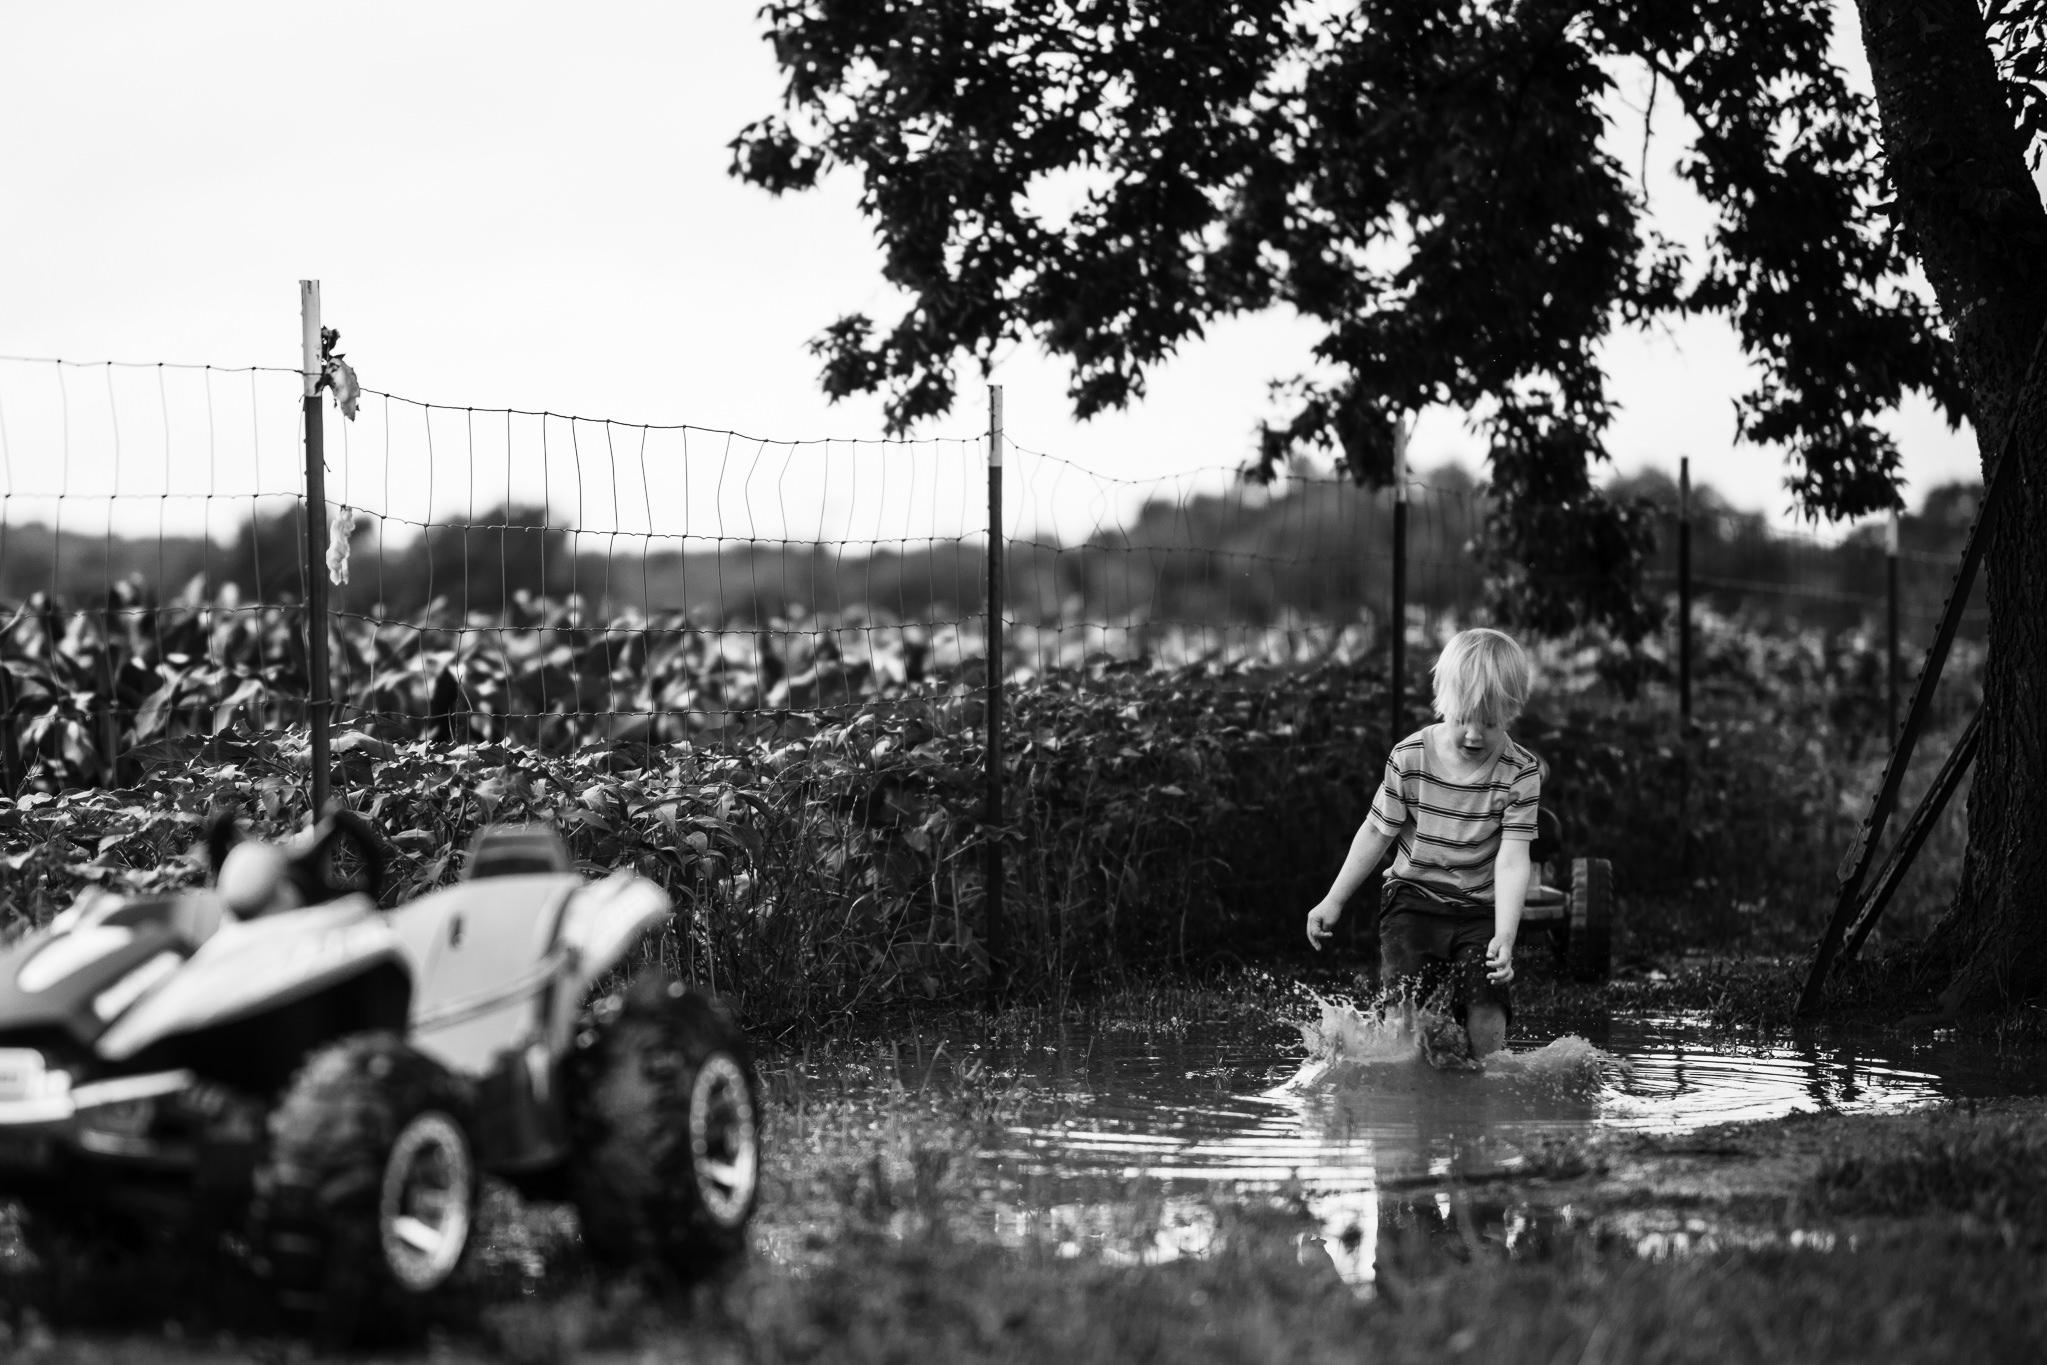 muddy-spring-day-rural-life-photography03.jpg